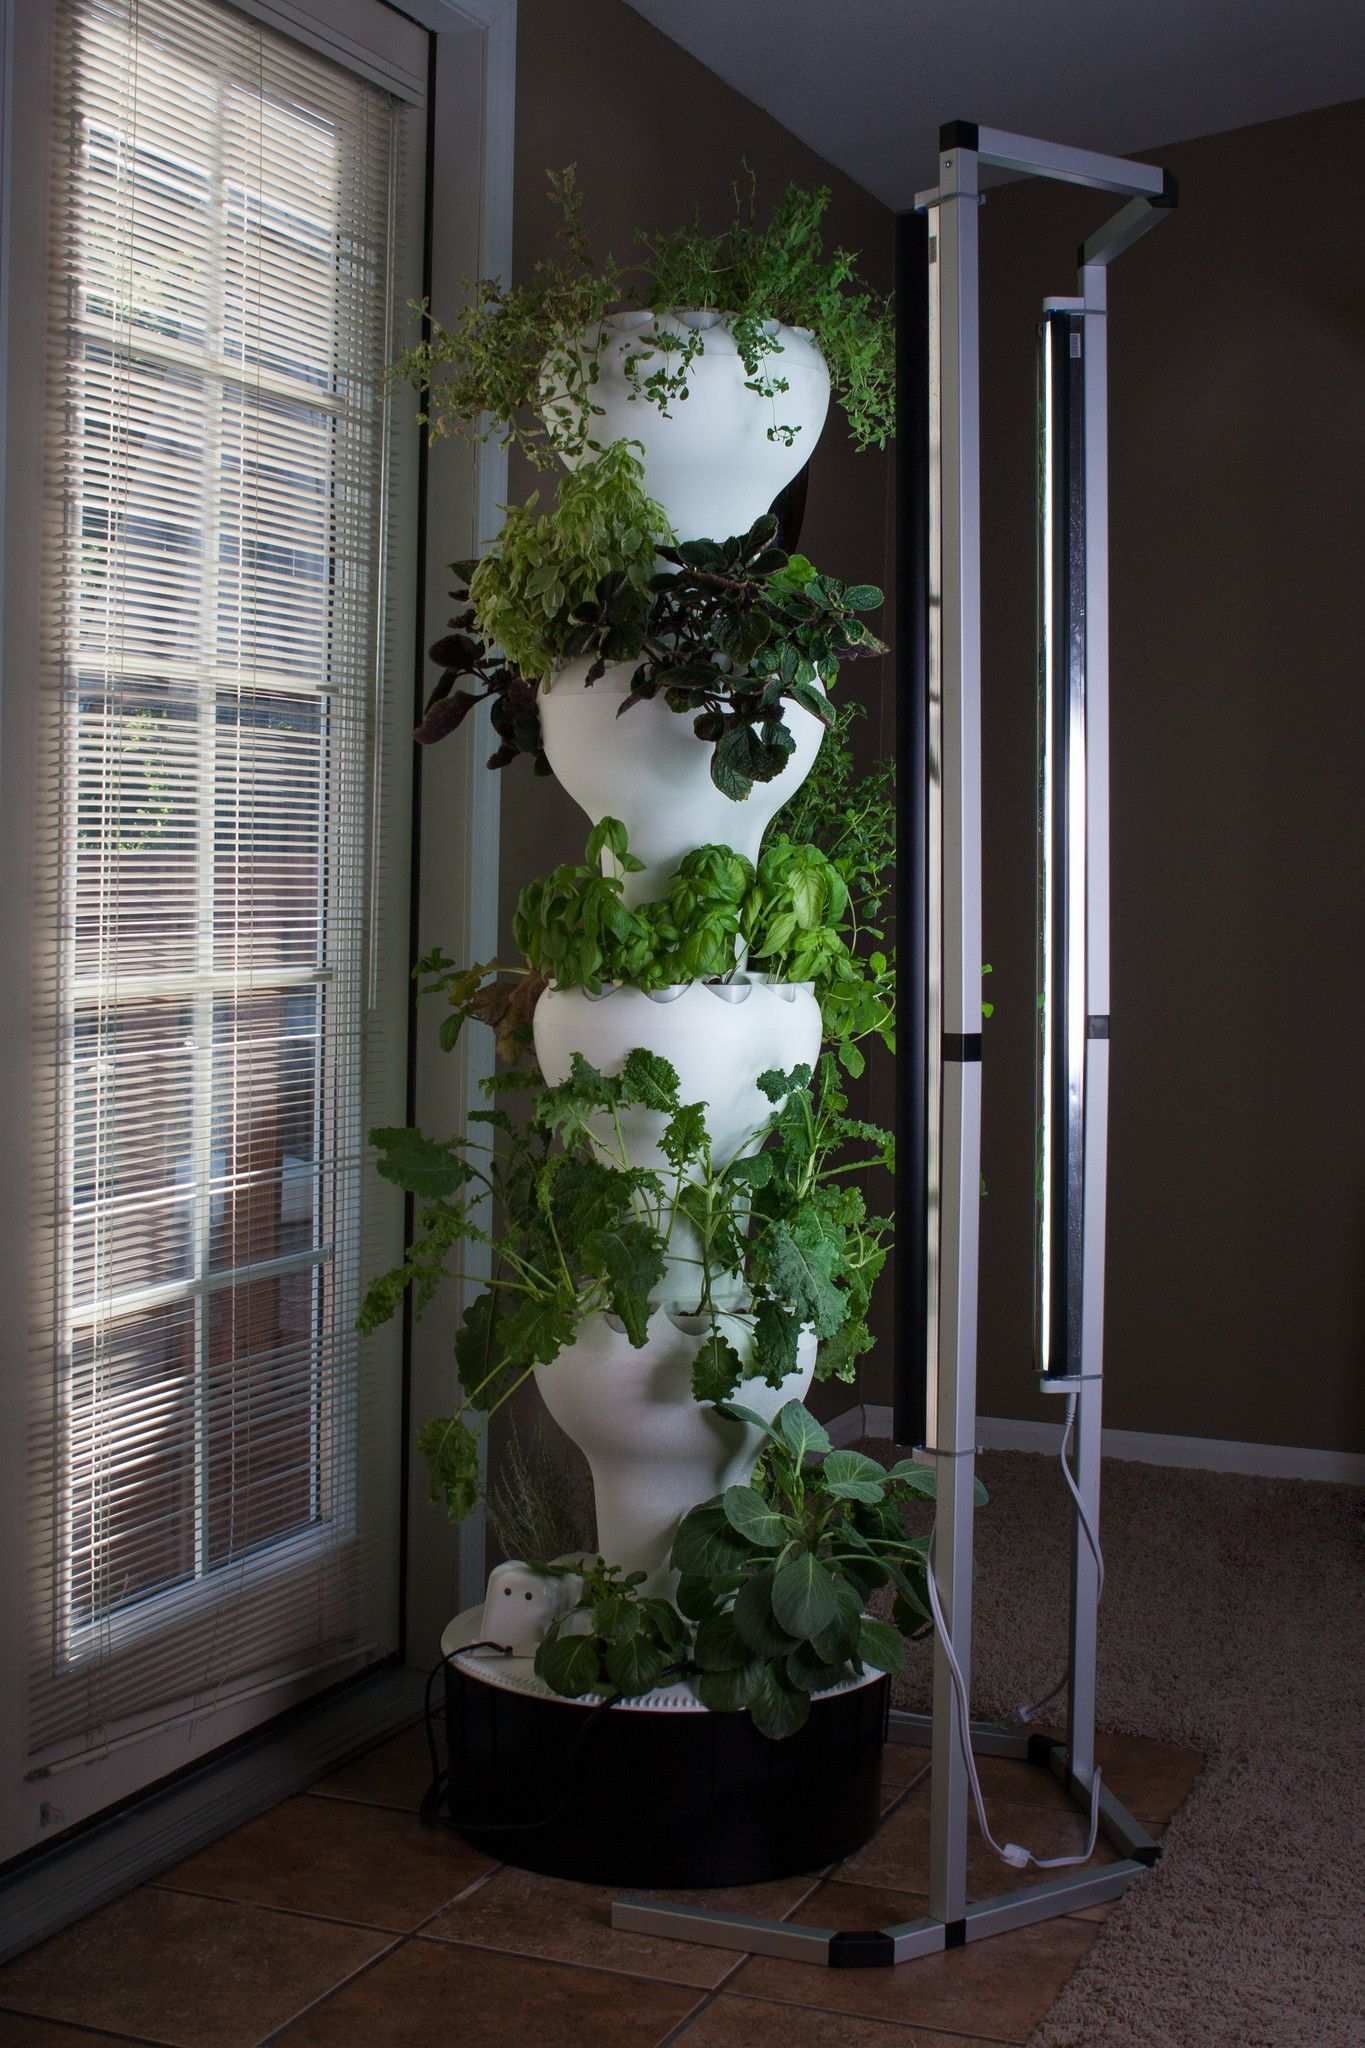 T5 Vertical Grow Lighting Foody Vertical Gardens Aquaponics Vertical Garden Aquaponics System